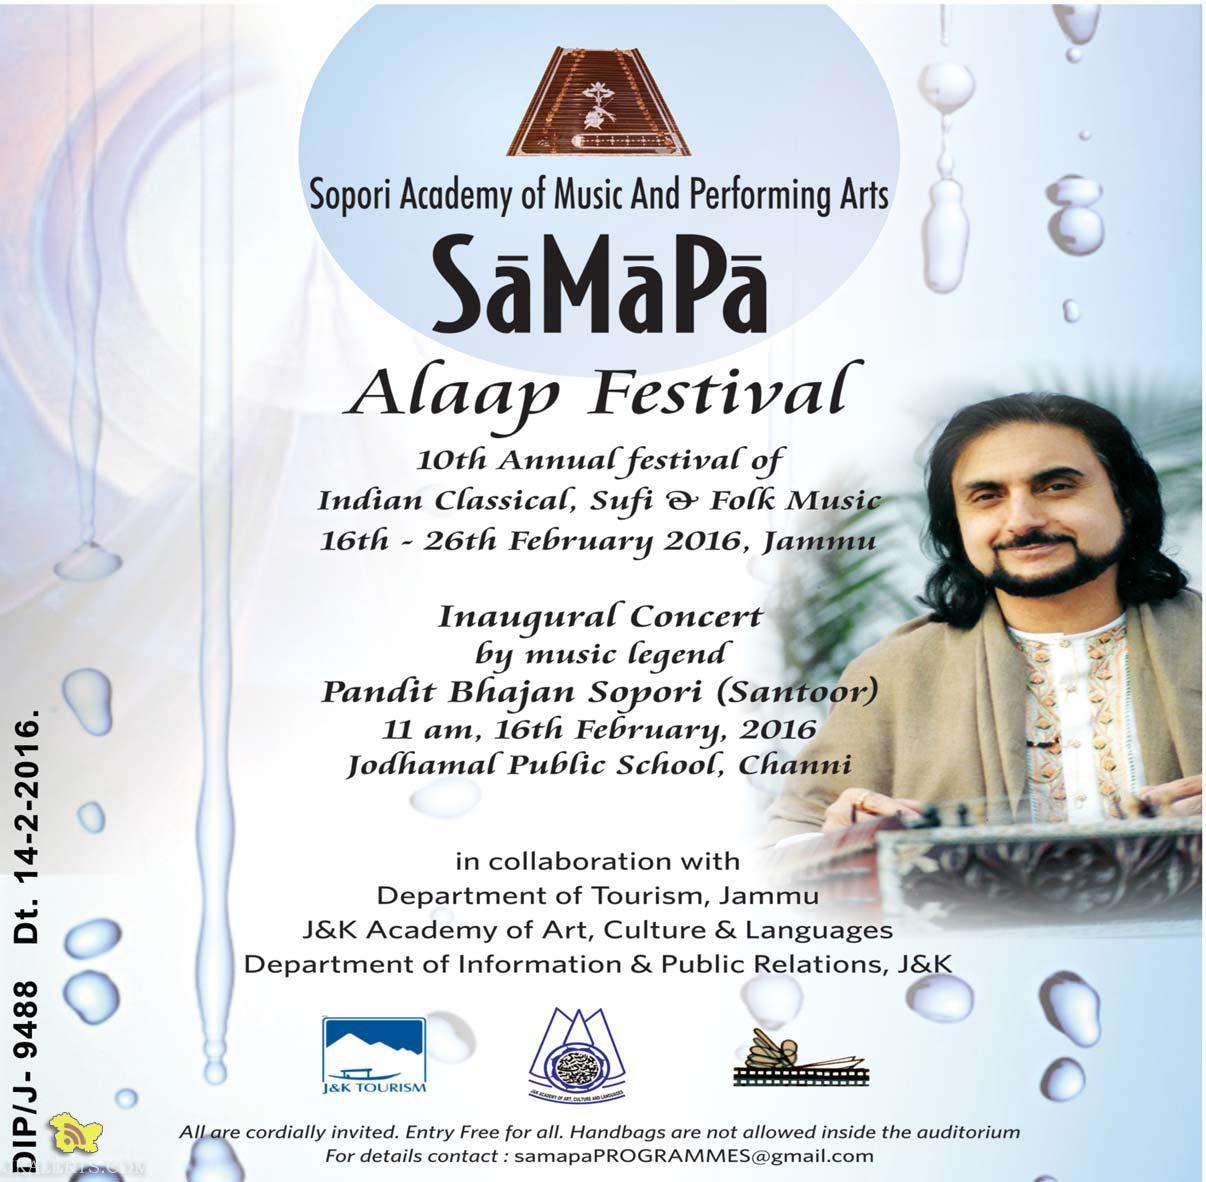 SaMaPa Alaap Festival 16th - 26th February 2016, Jammu